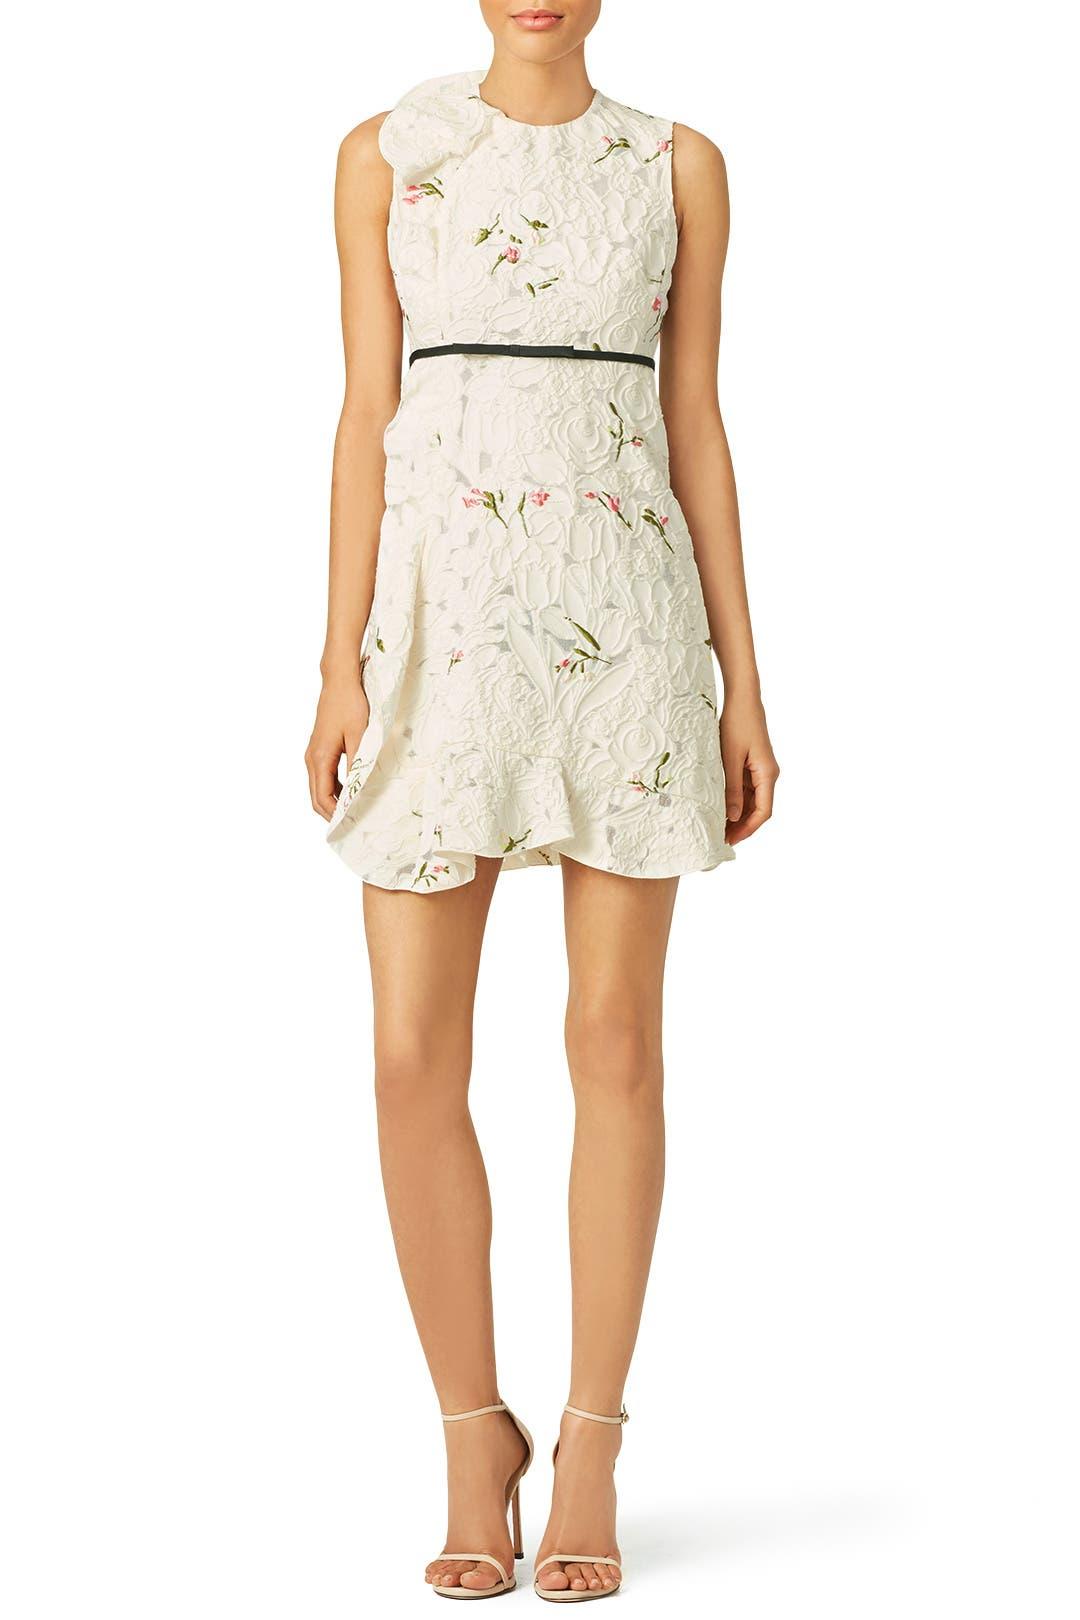 Giambattista Valli Throwing Roses Dress